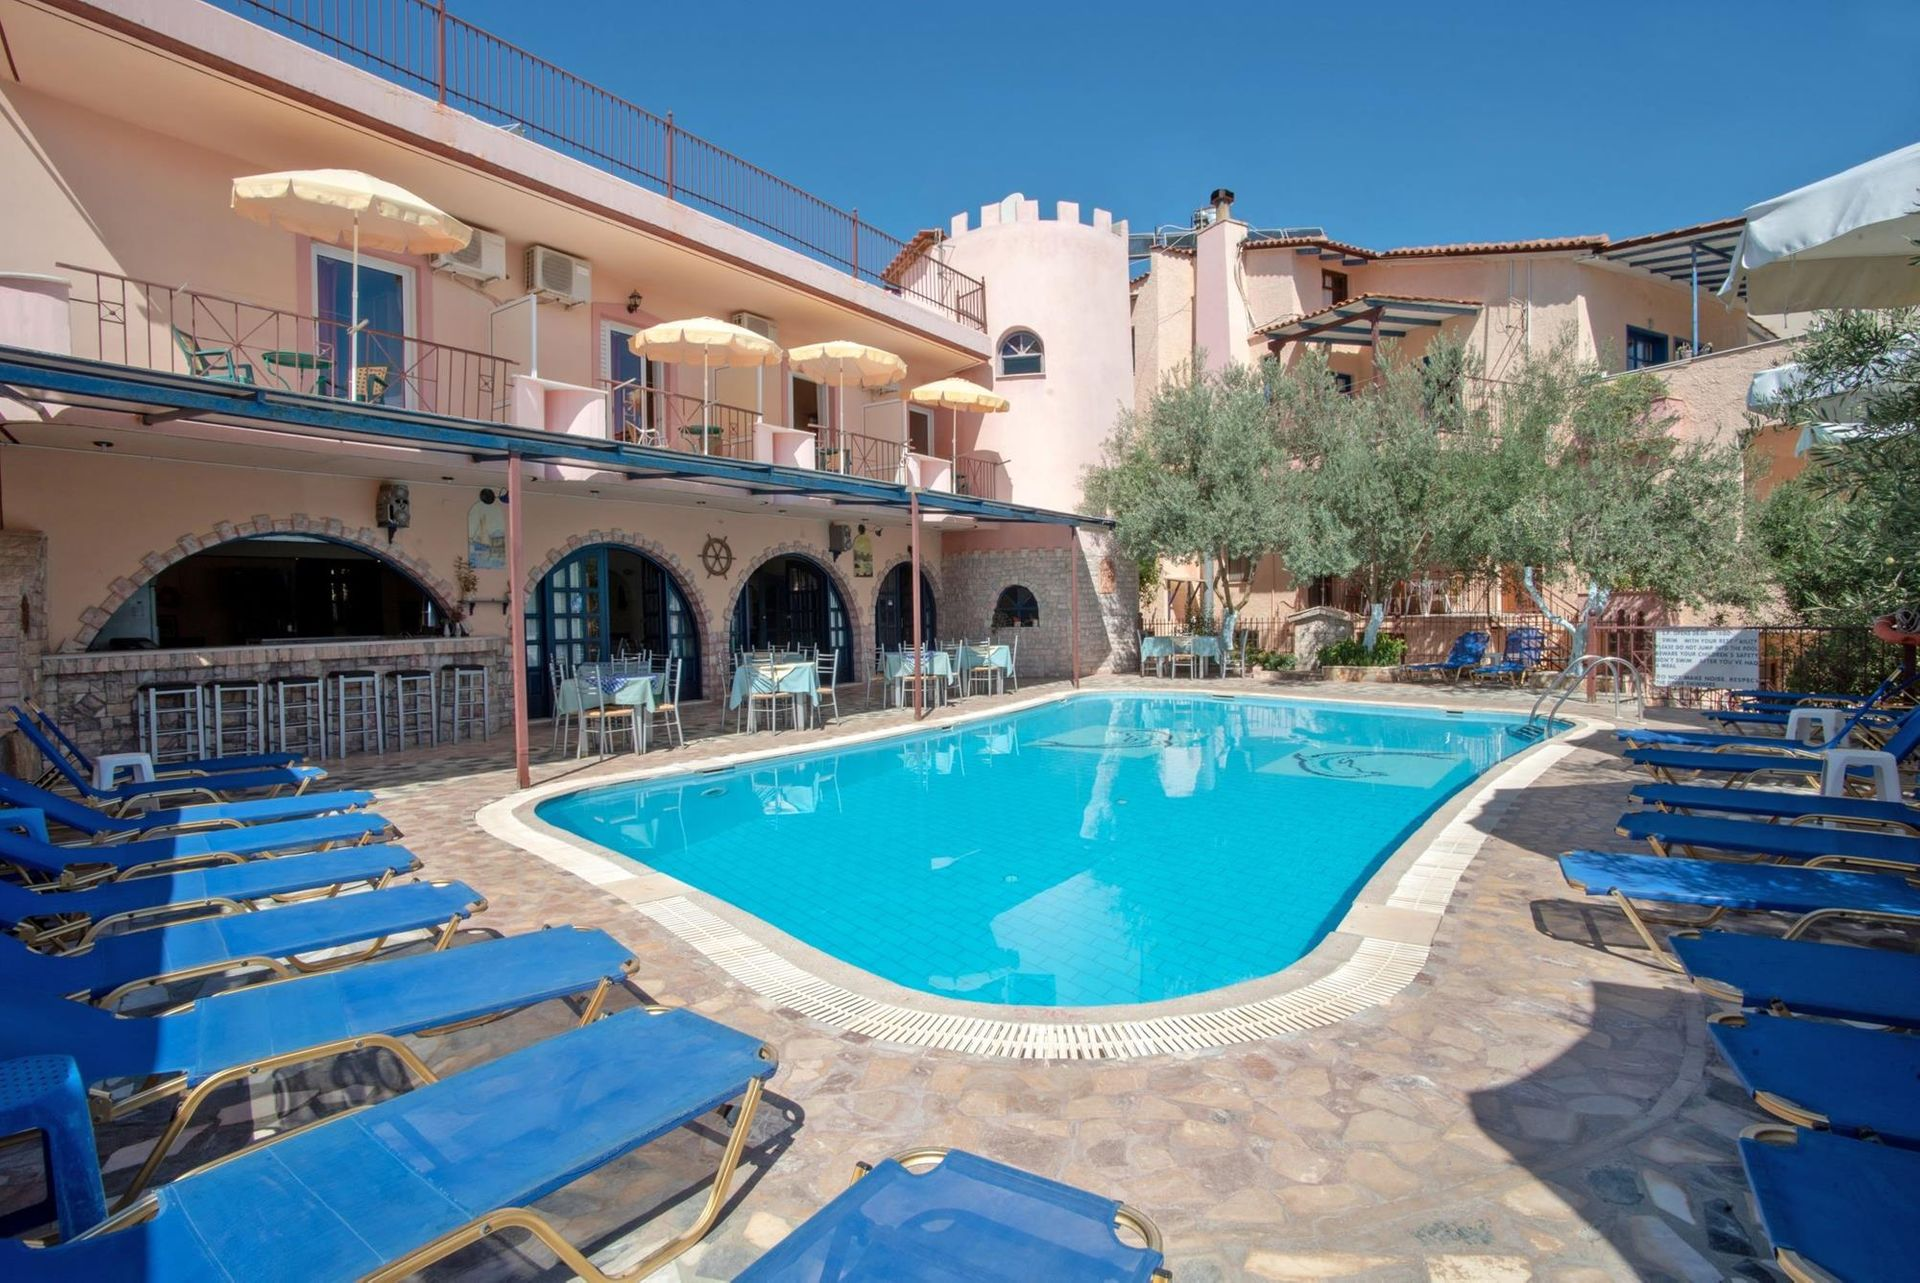 Kleoni Hotel & Apartments Tolo - Τολό ✦ -20% ✦